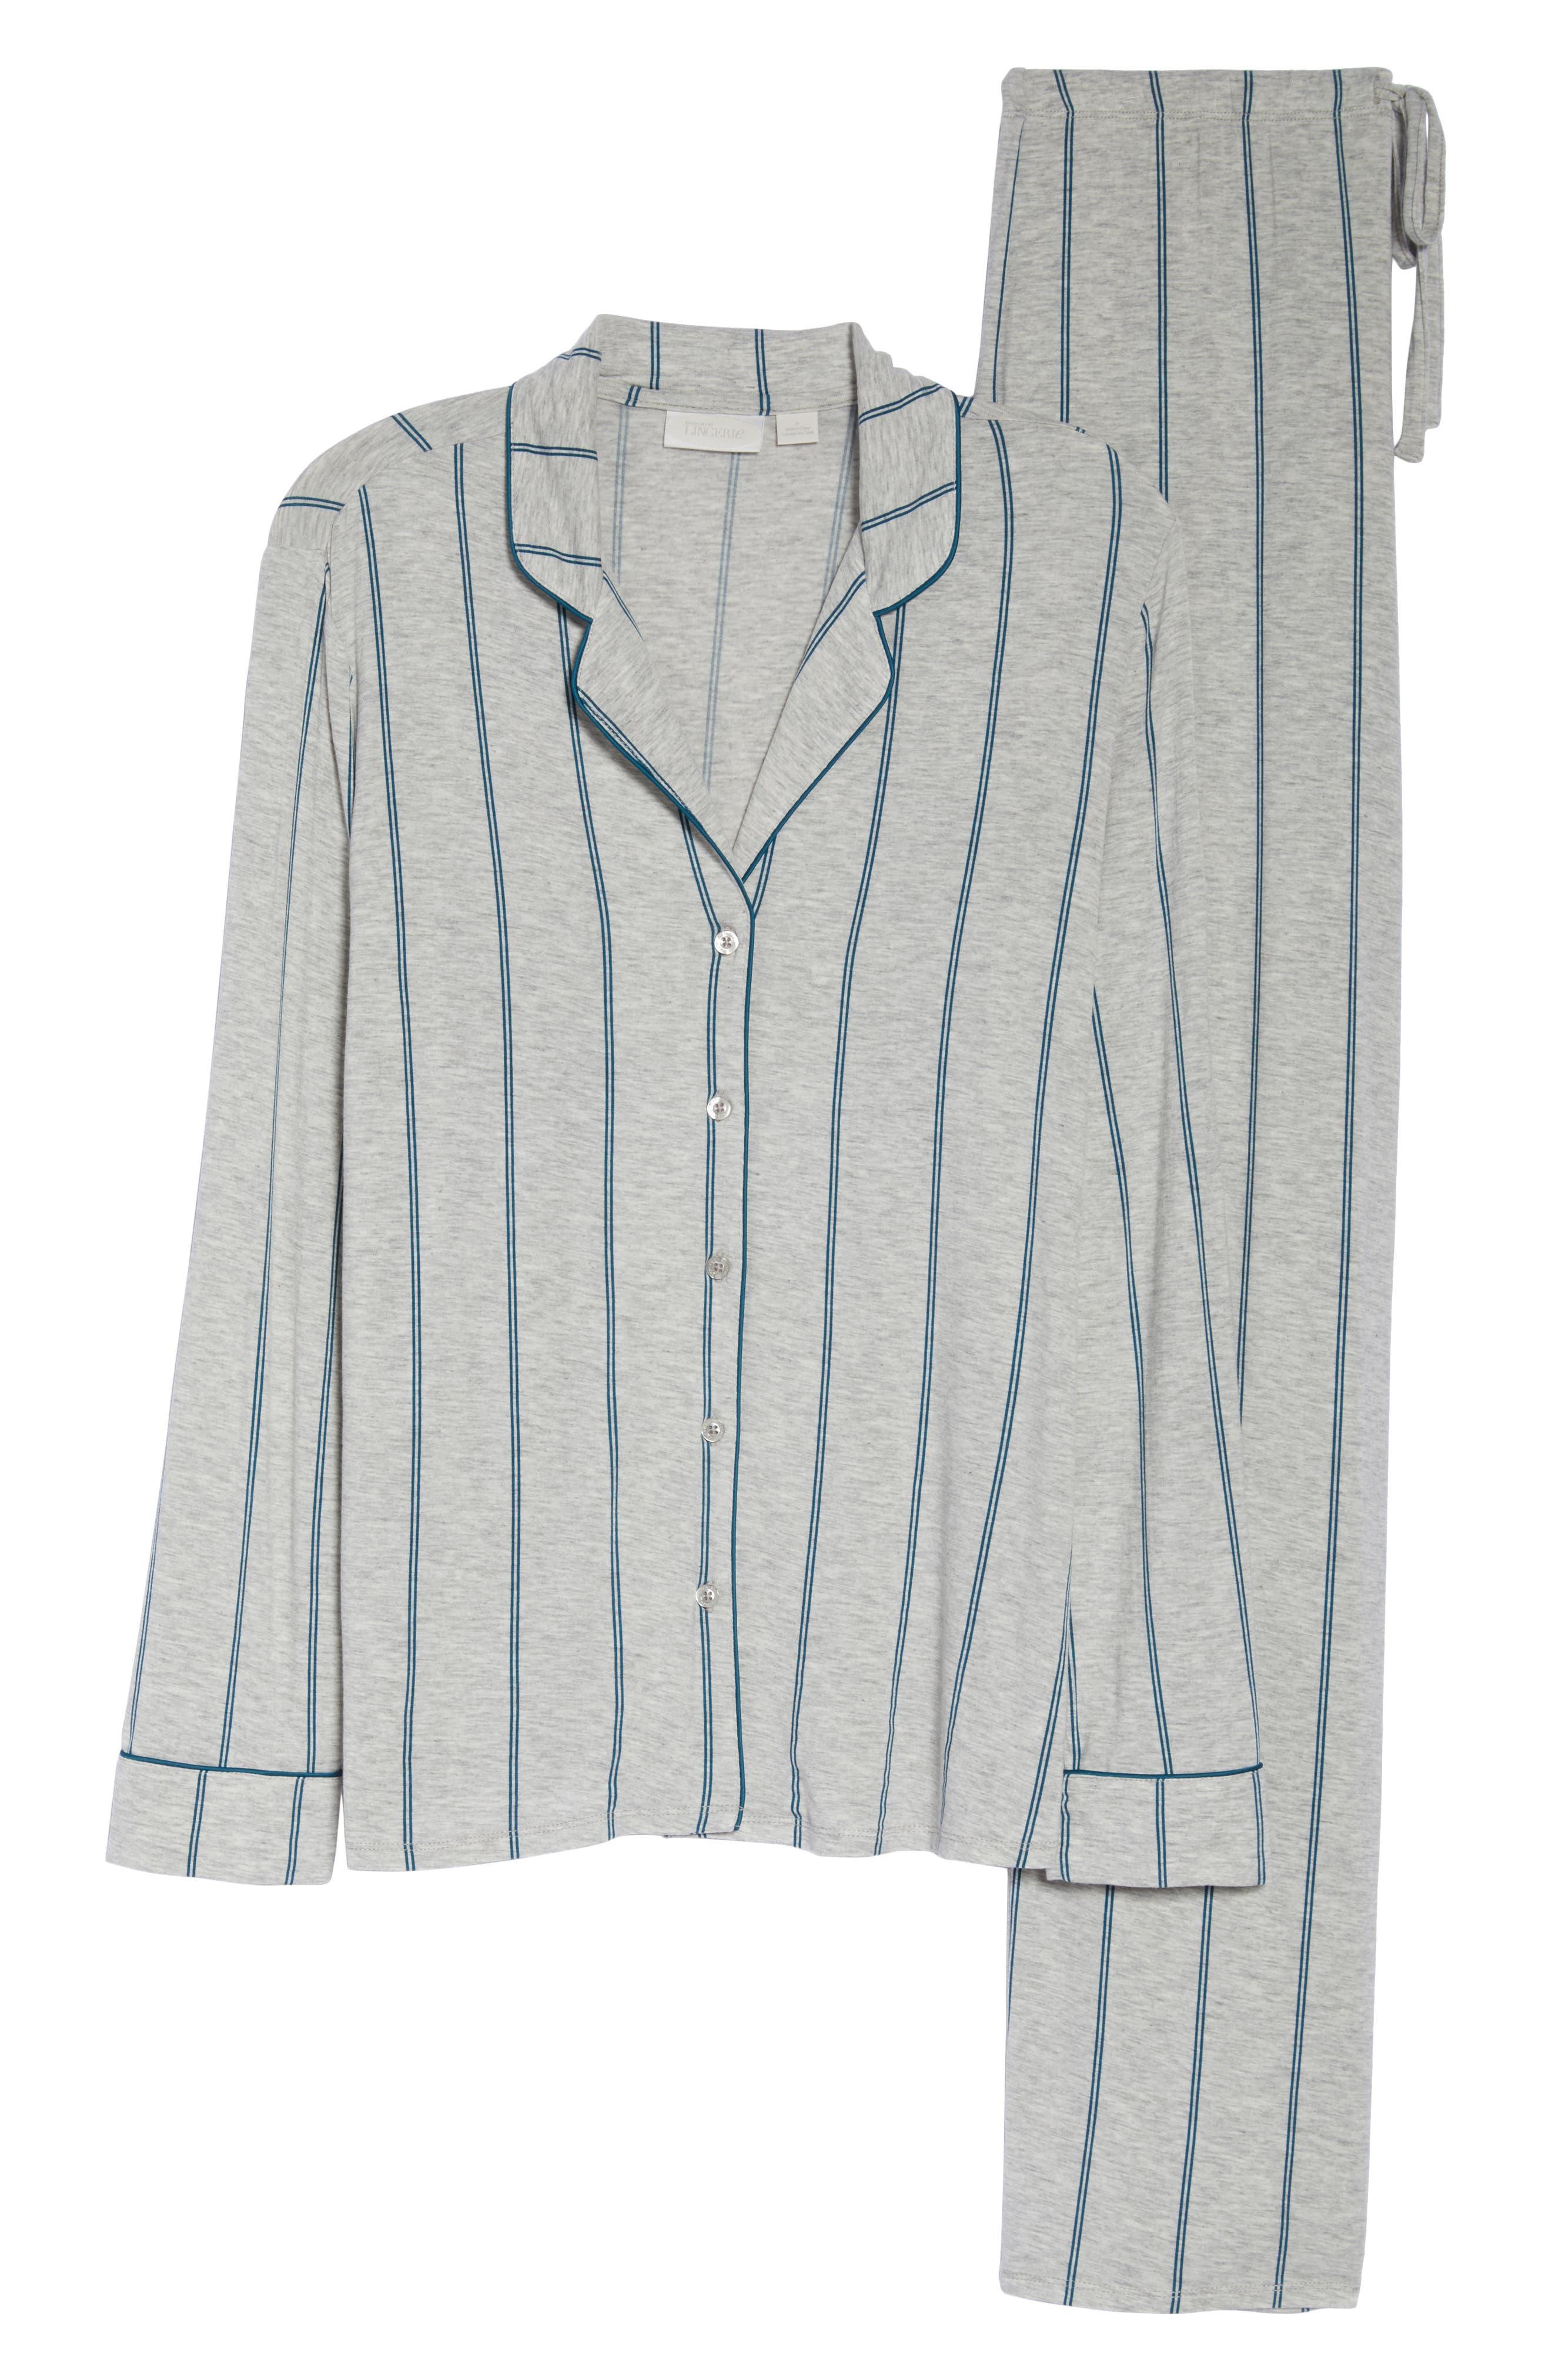 NORDSTROM LINGERIE, Moonlight Pajamas, Alternate thumbnail 6, color, GREY PEARL HEATHER MICROSTRIPE